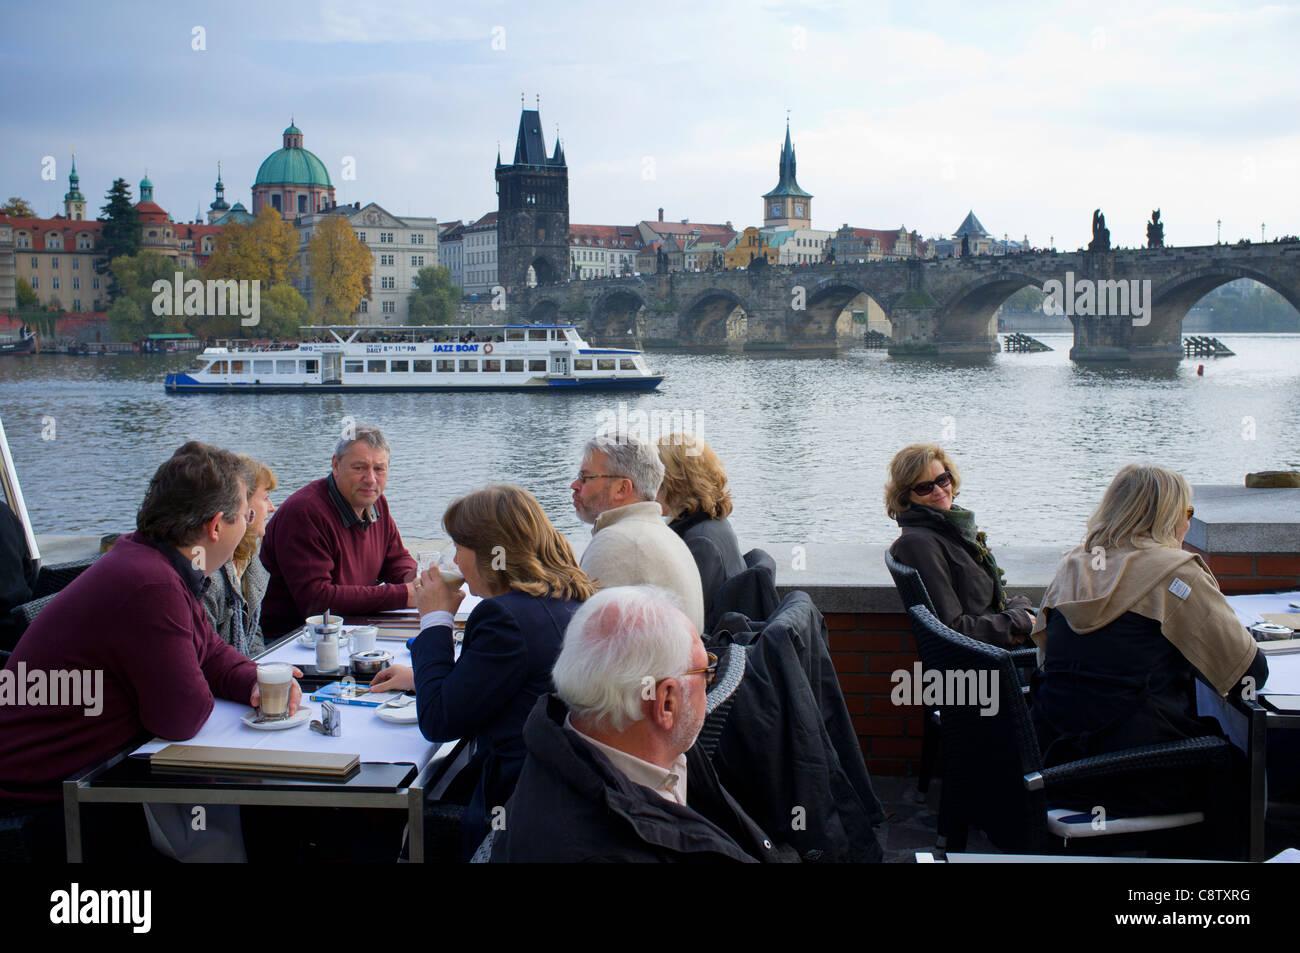 Cafe beside River Vltava in Prague in Czech Republic Stock Photo